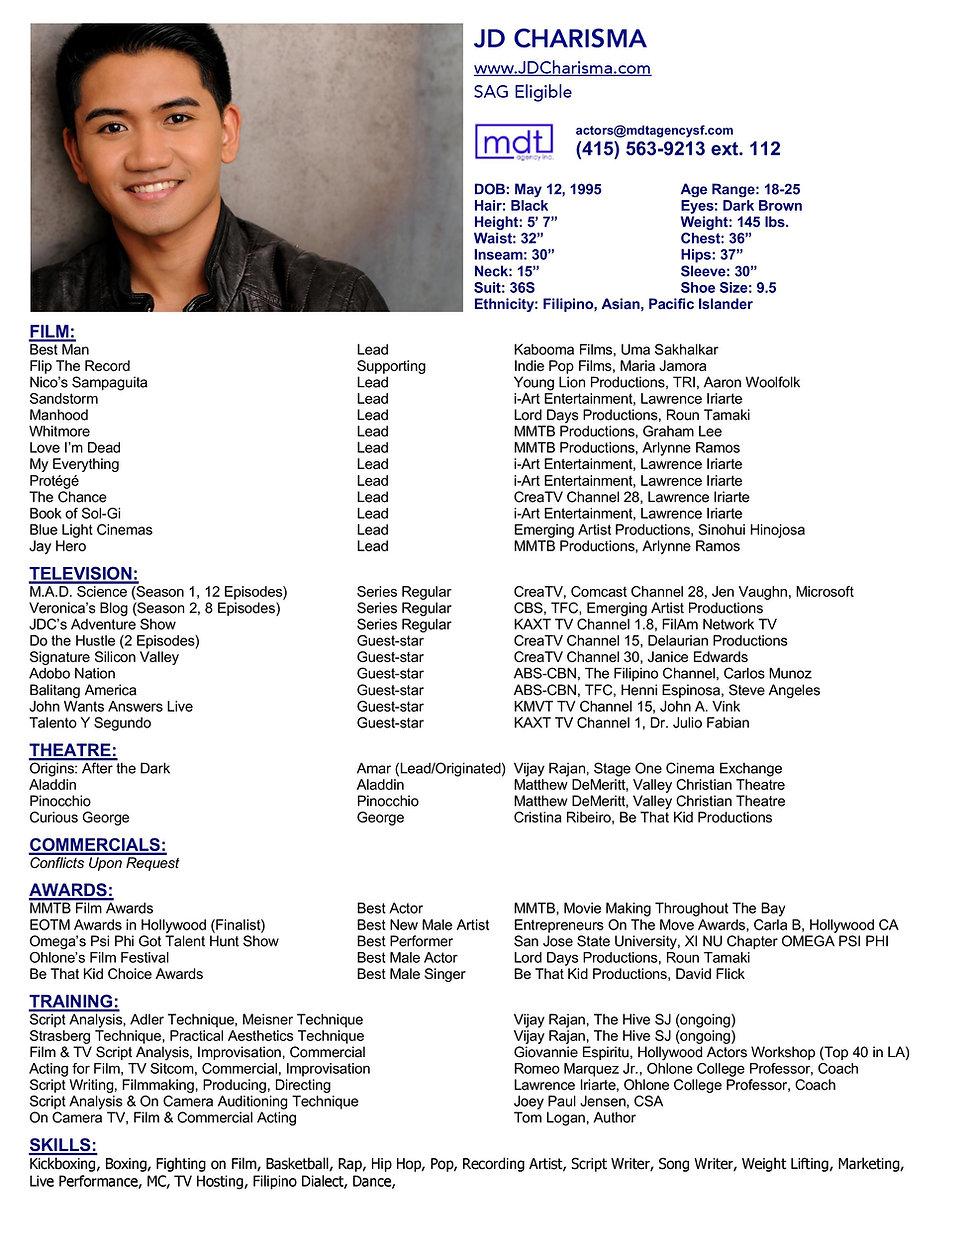 JD Charisma Resume 2021-page-001.jpg